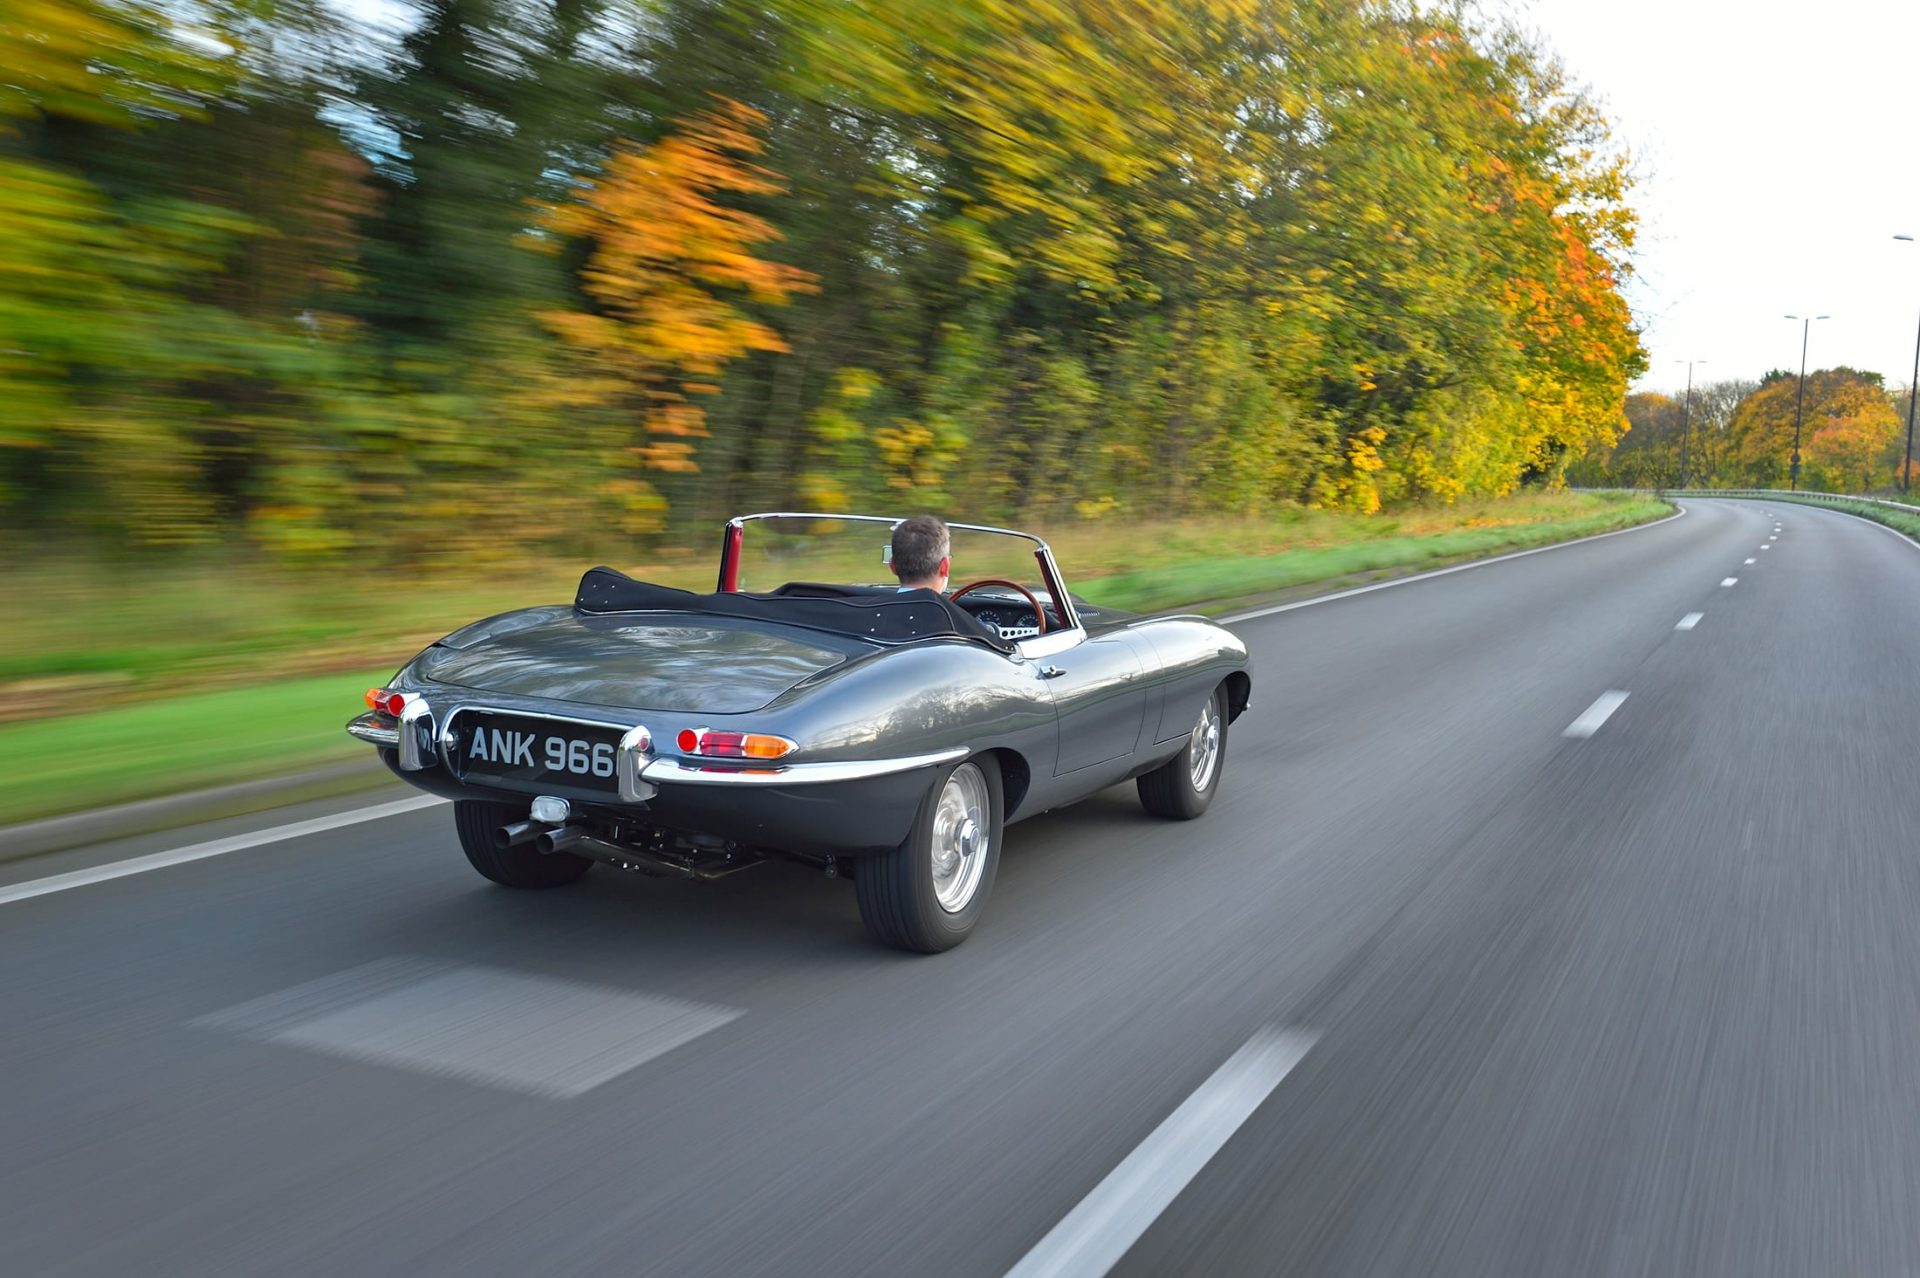 Jaguar classic car driving on the road